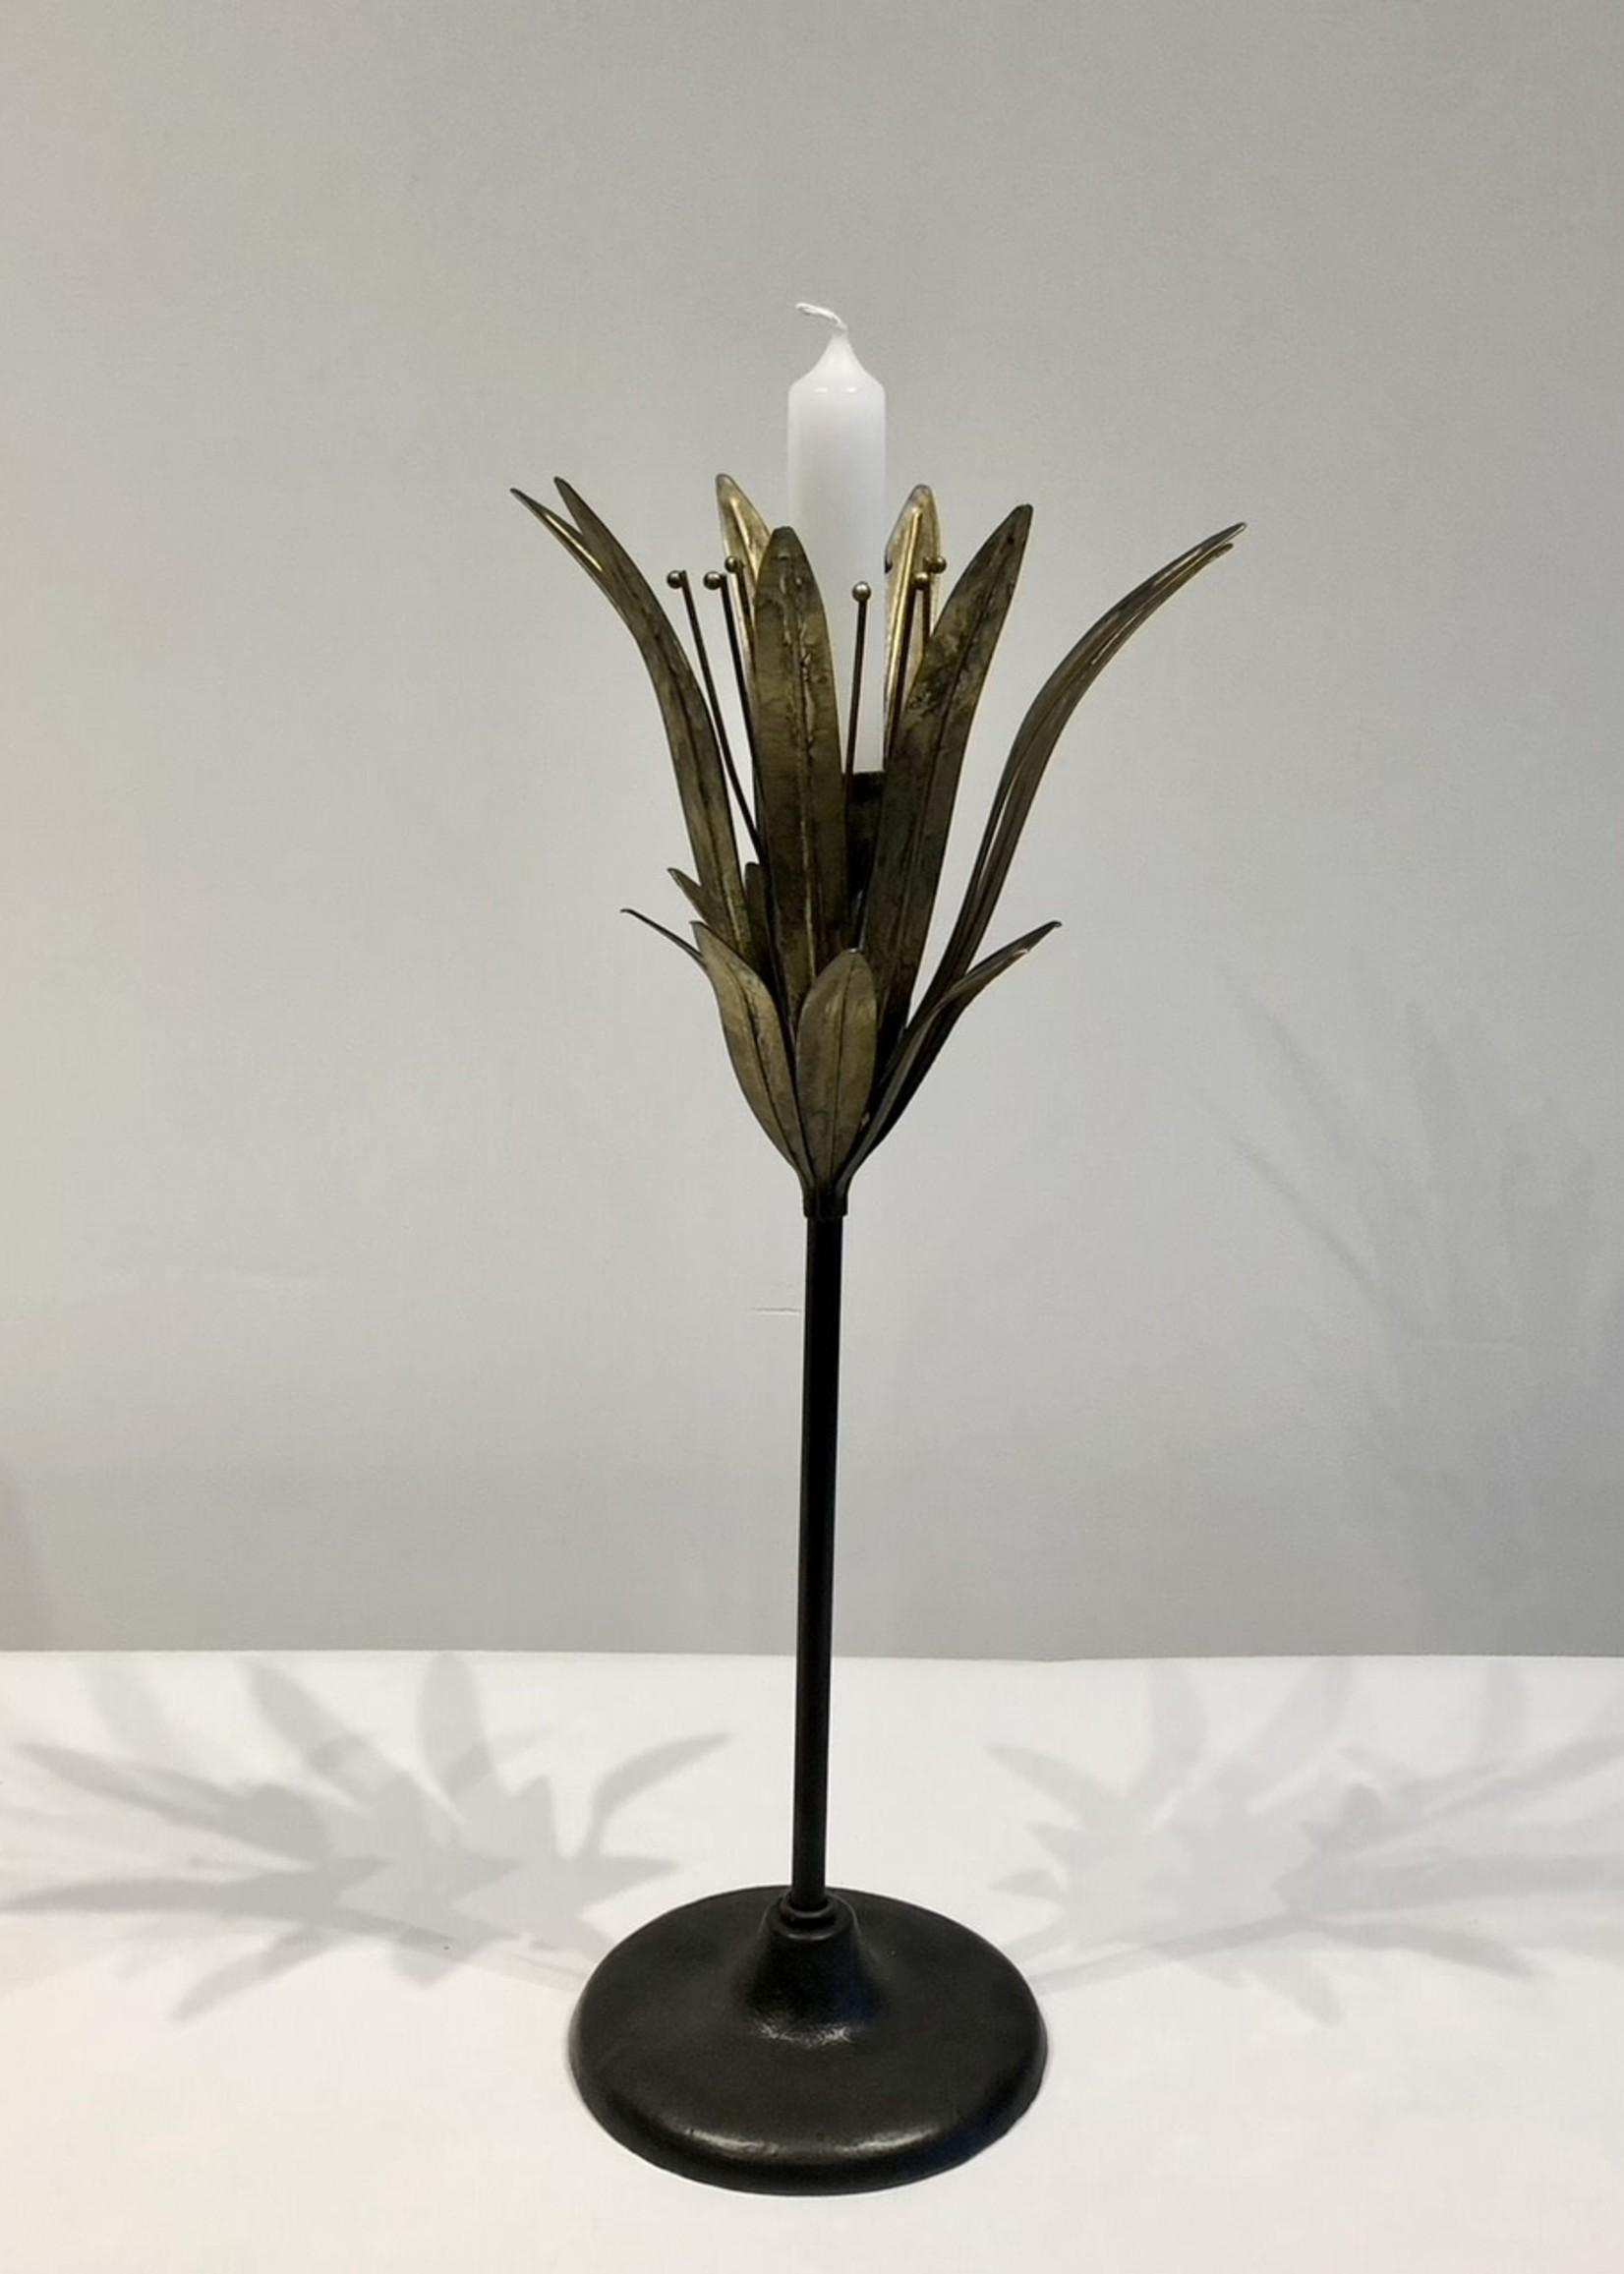 ShiShi Kandelaar LELIE small 37 cm